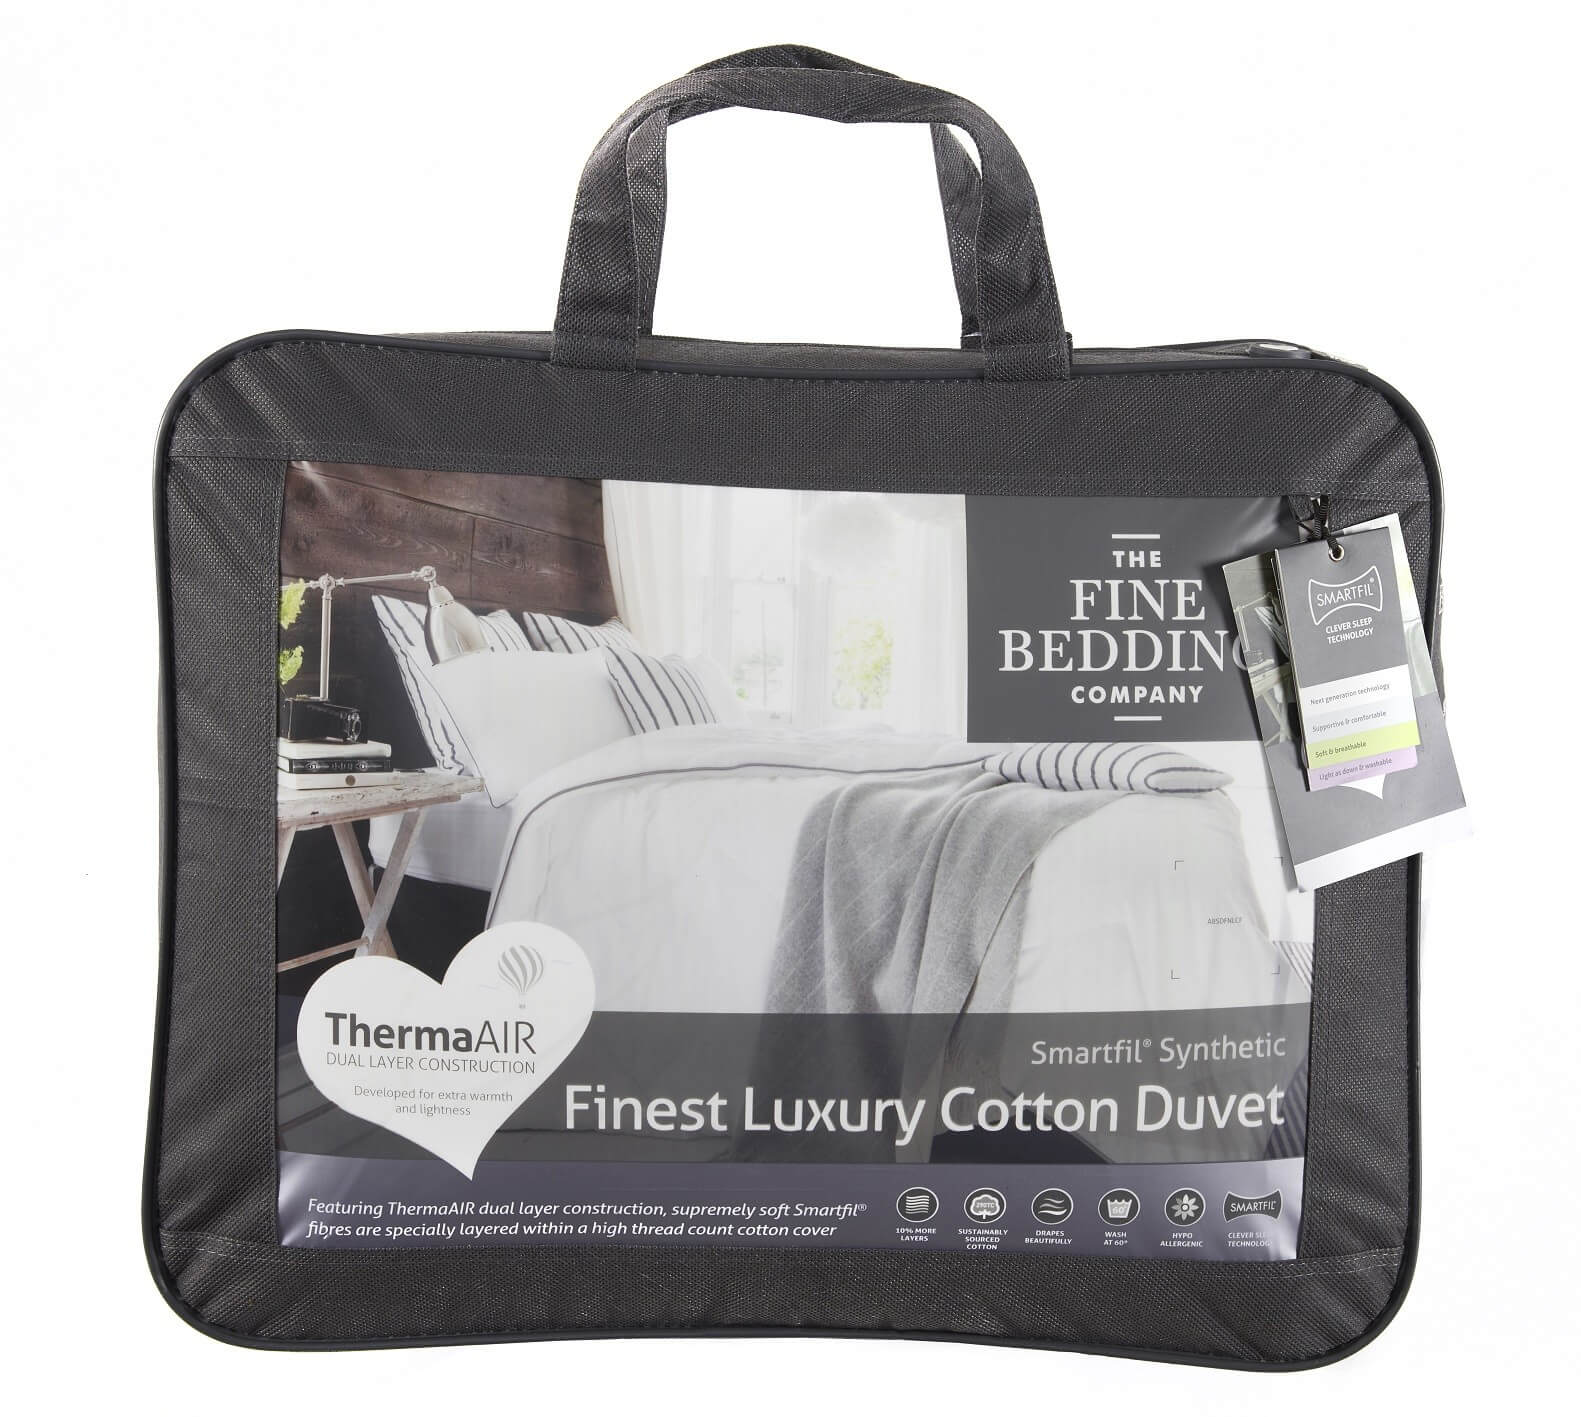 Finest Luxury Cotton -The Fine Bedding Company Duvet